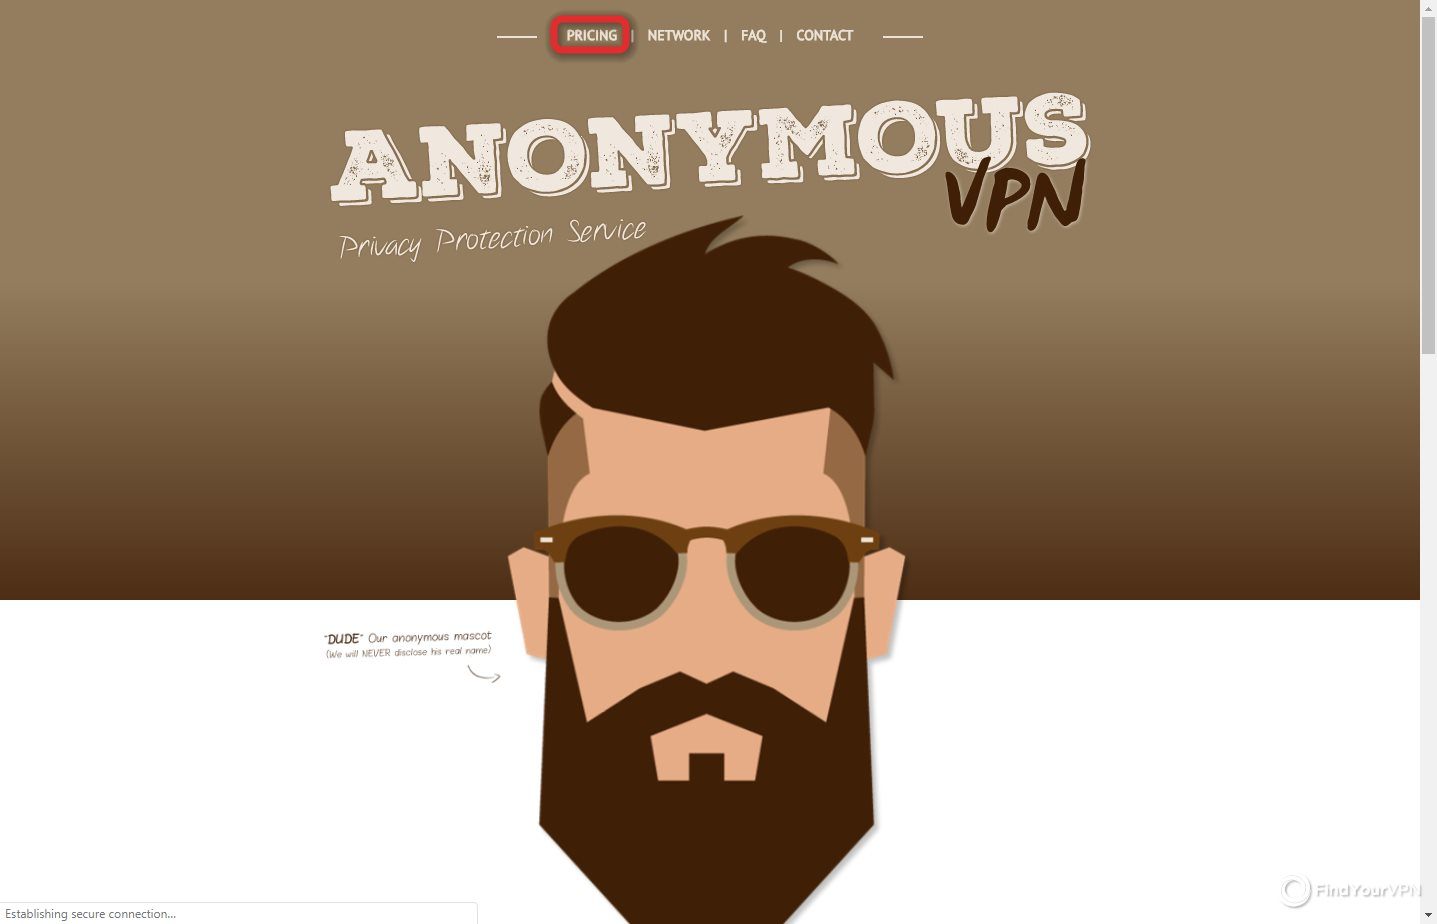 AnonymousVPN landing page